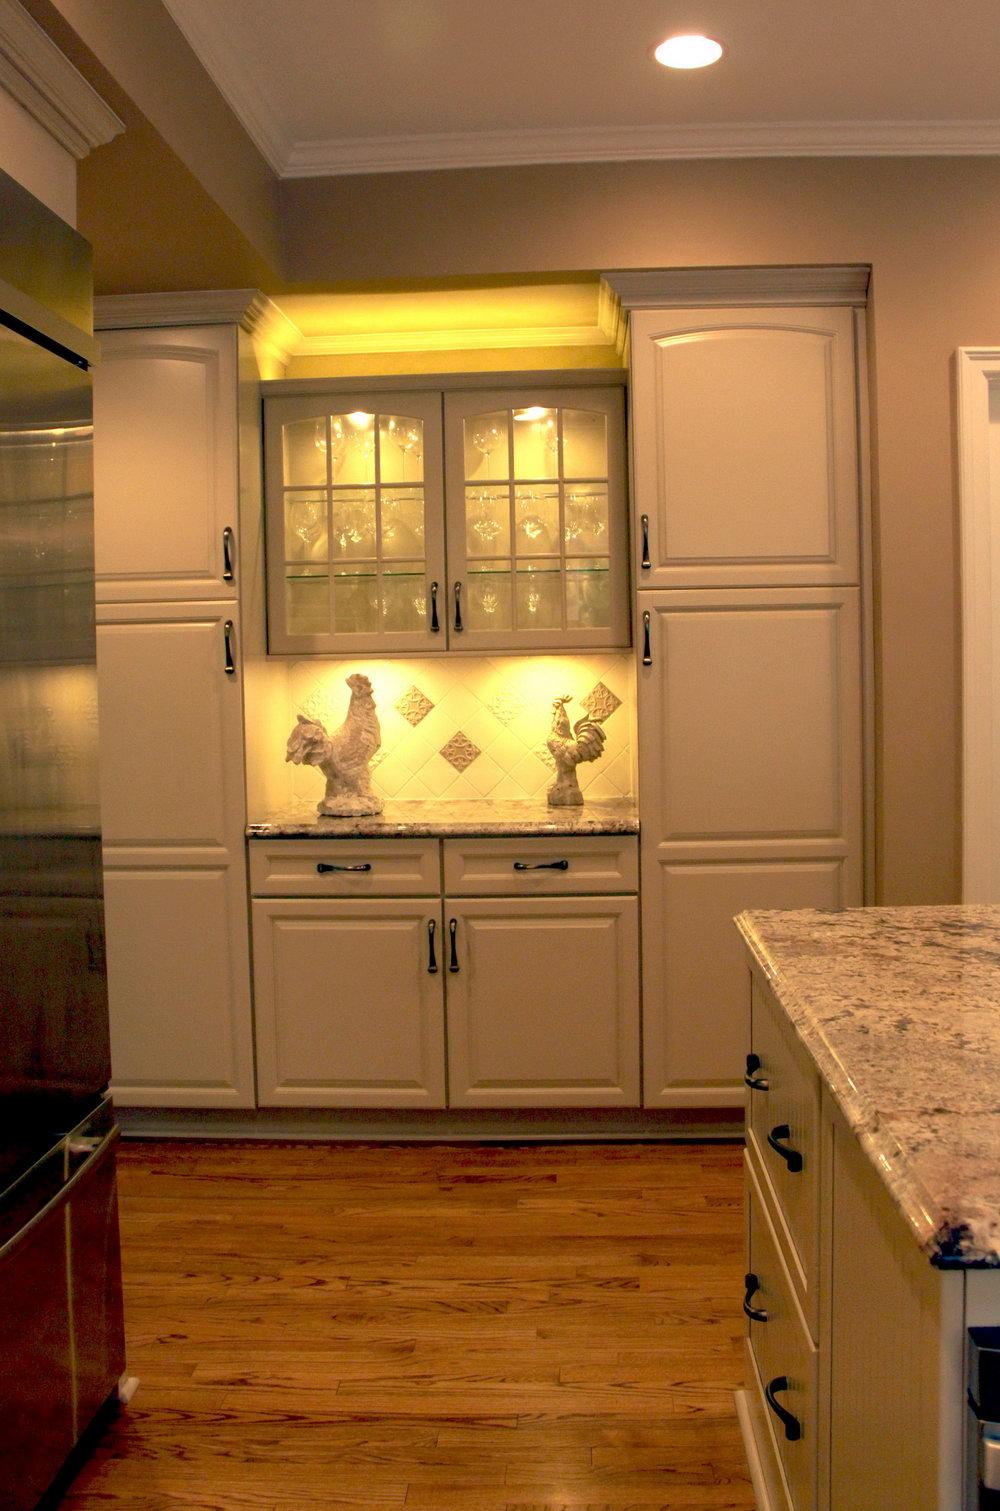 Kitchen Cabinet Glass Door Designs